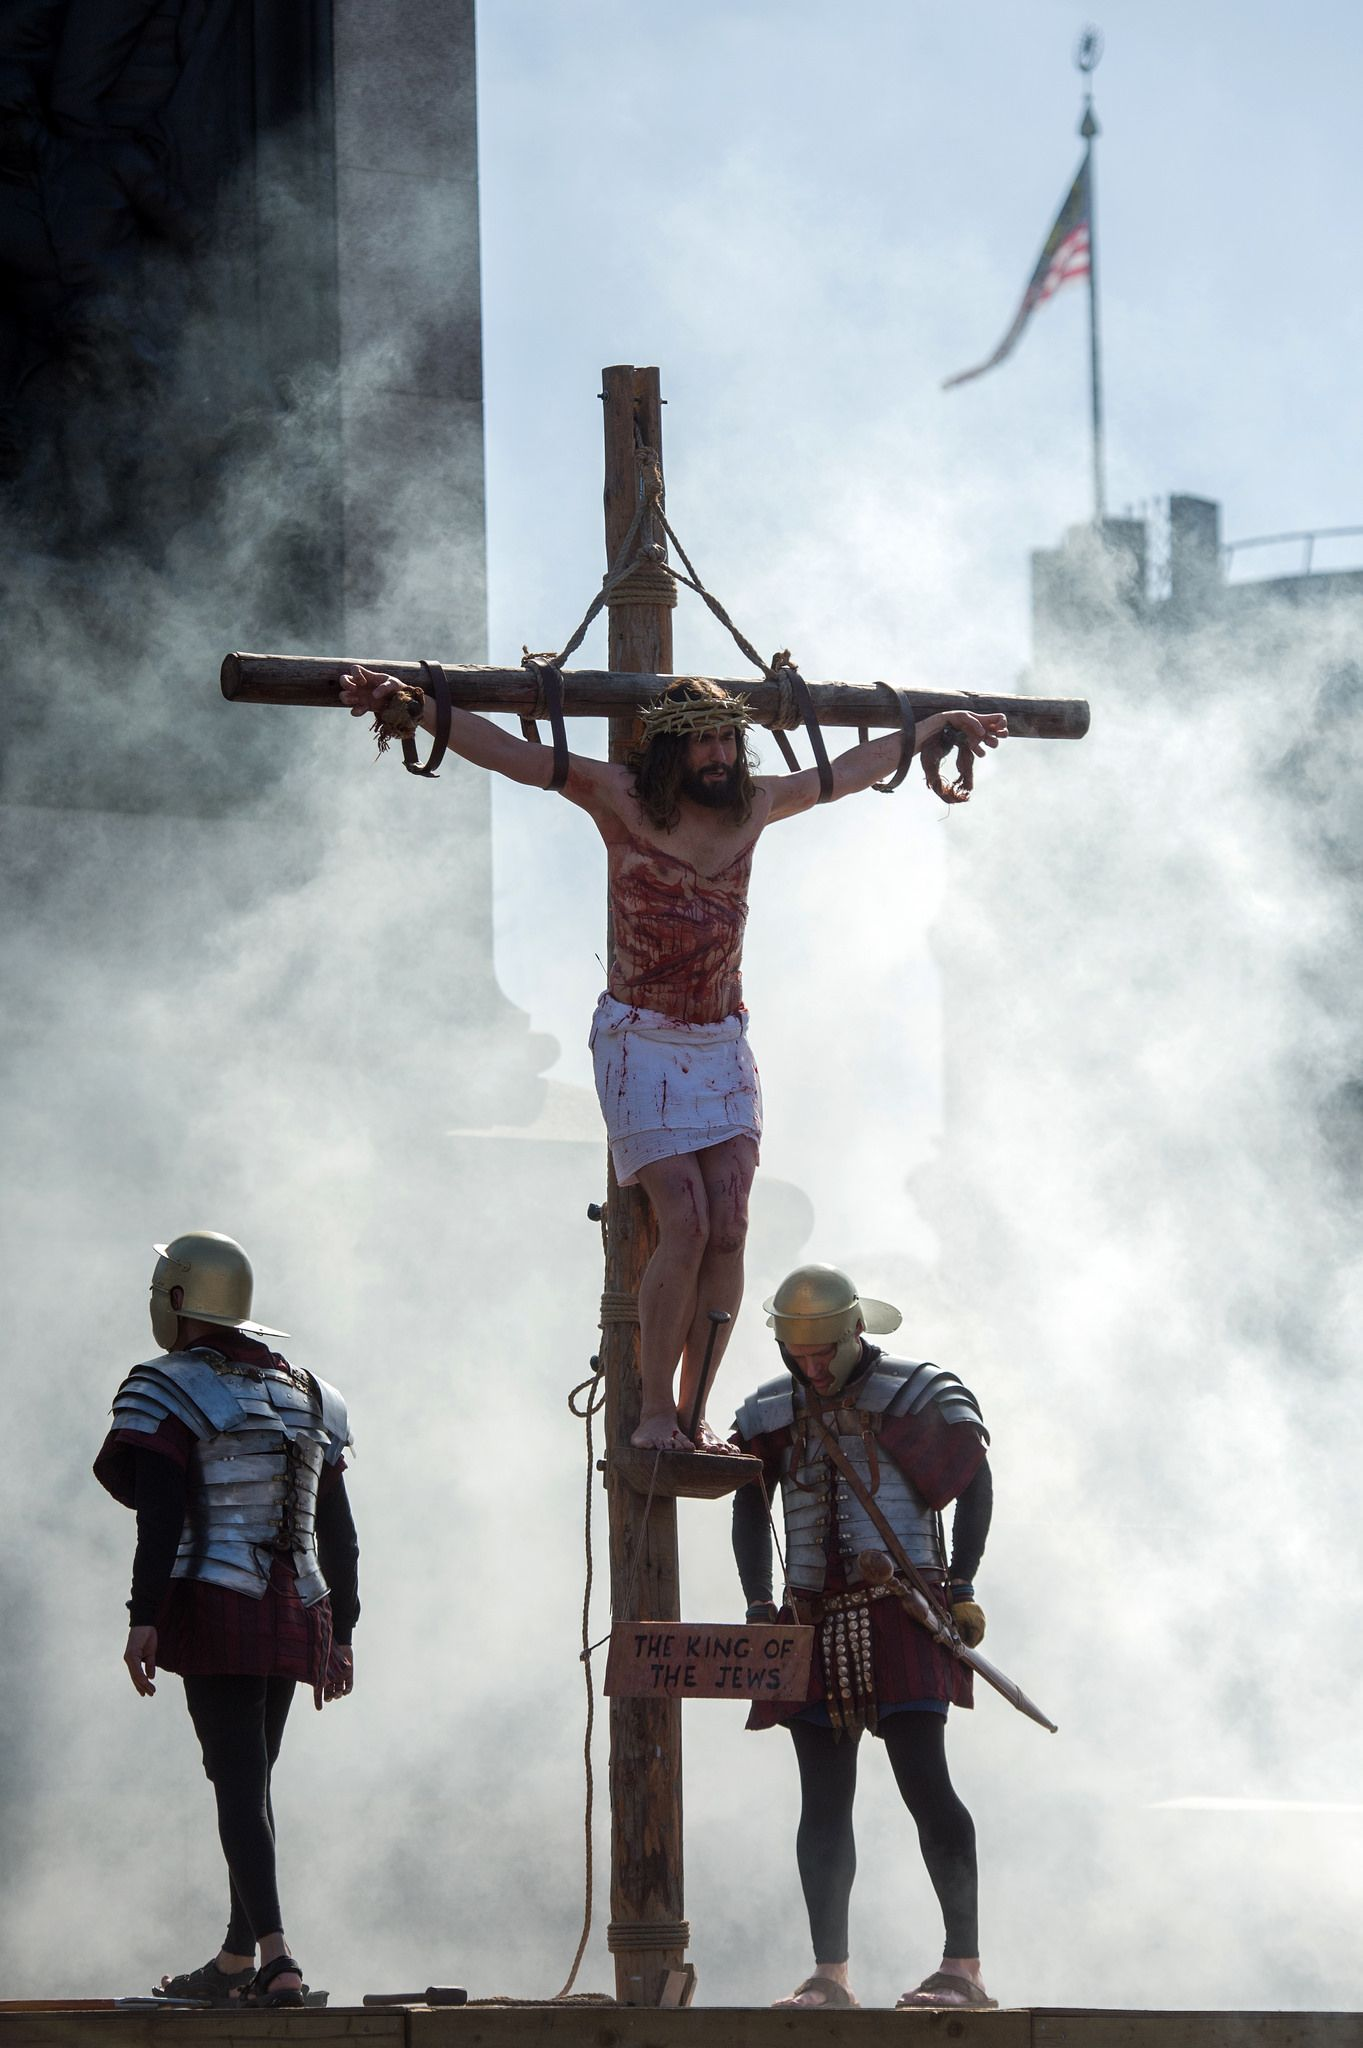 Passion of Jesus Statue News Report - www.PassionofJesus